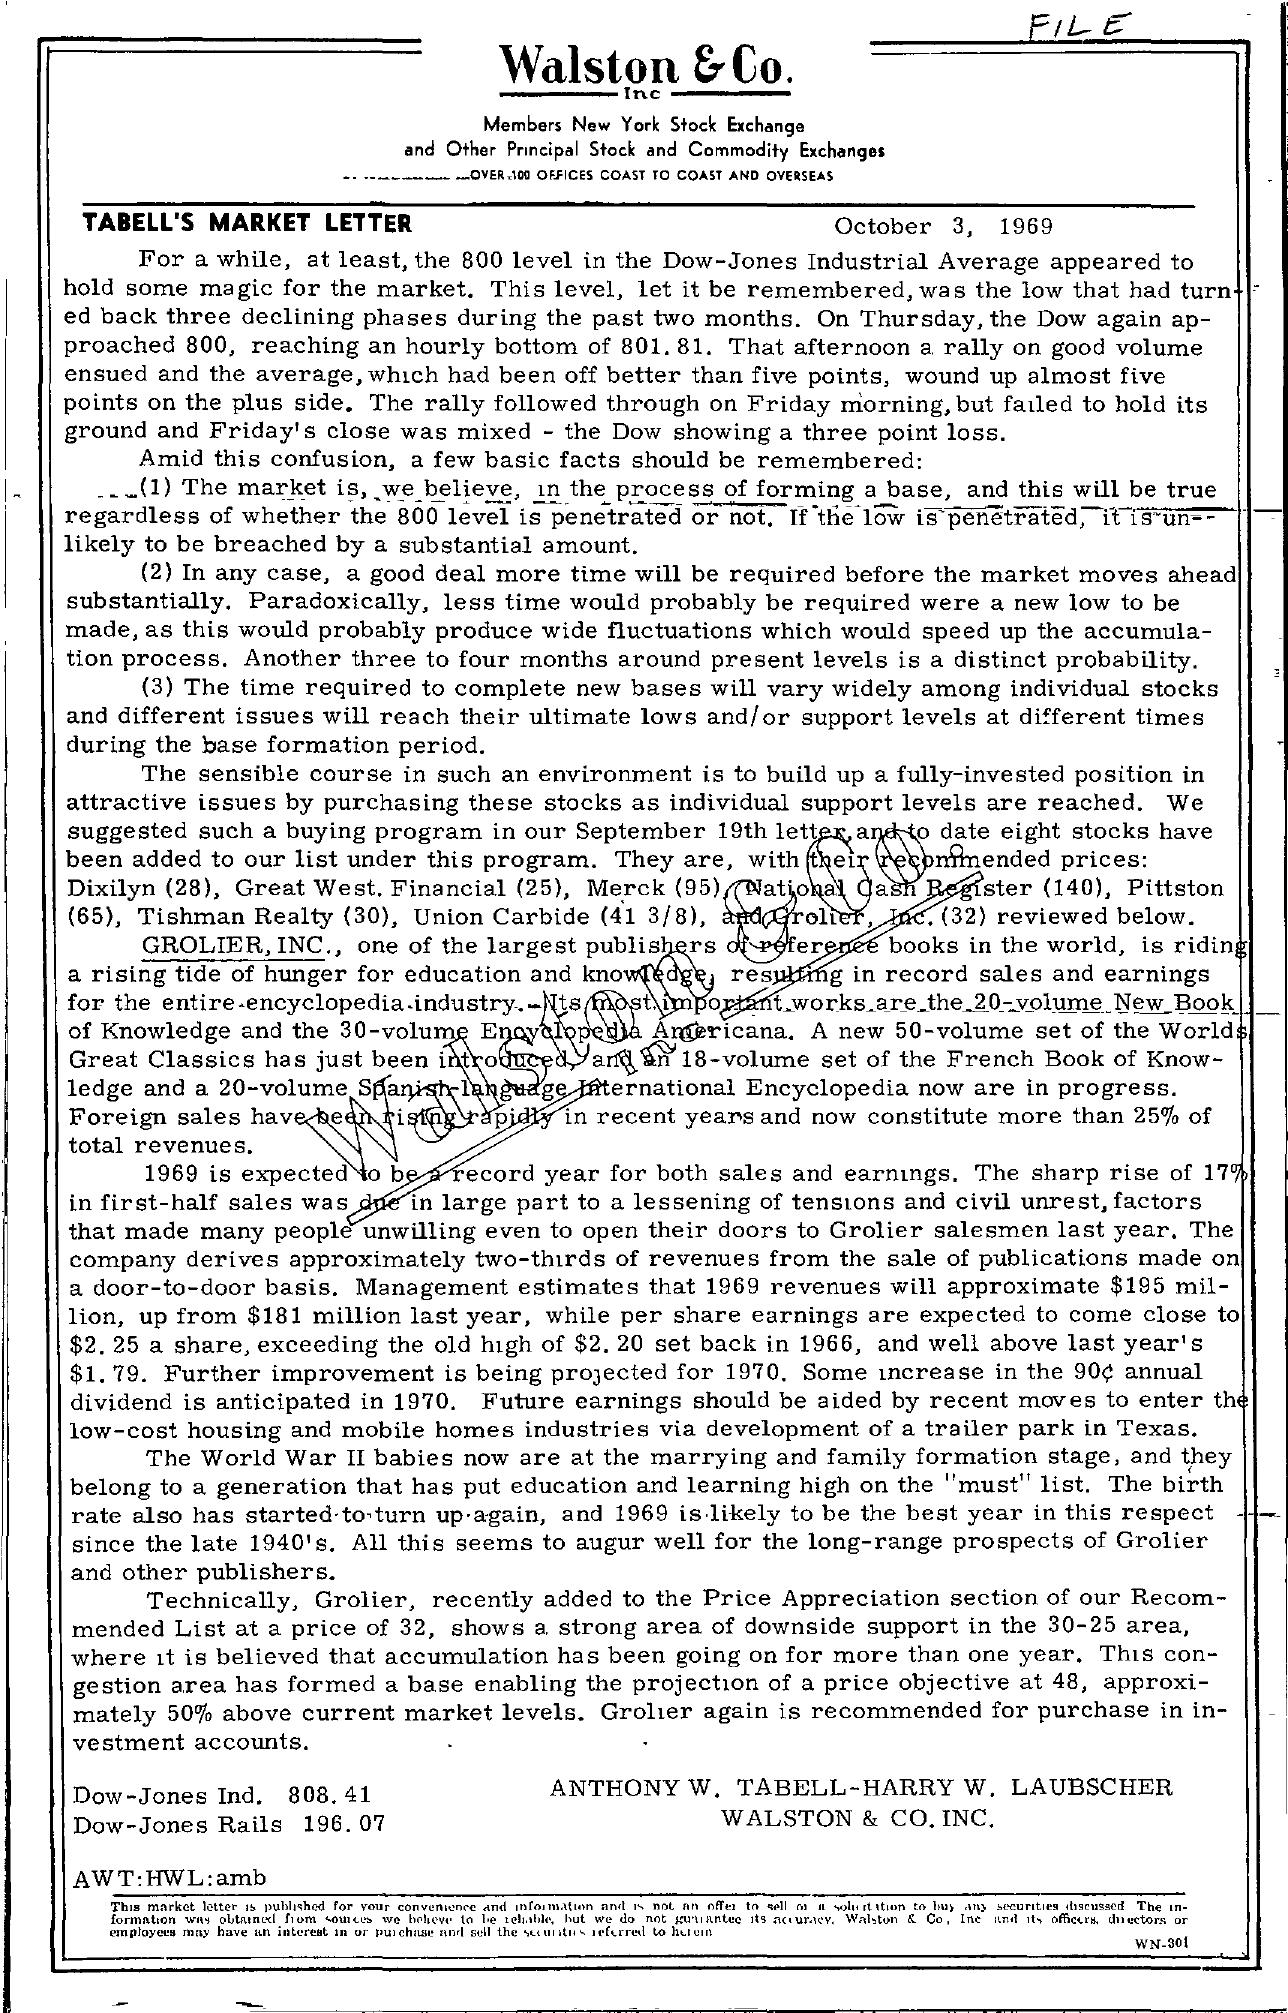 Tabell's Market Letter - October 03, 1969